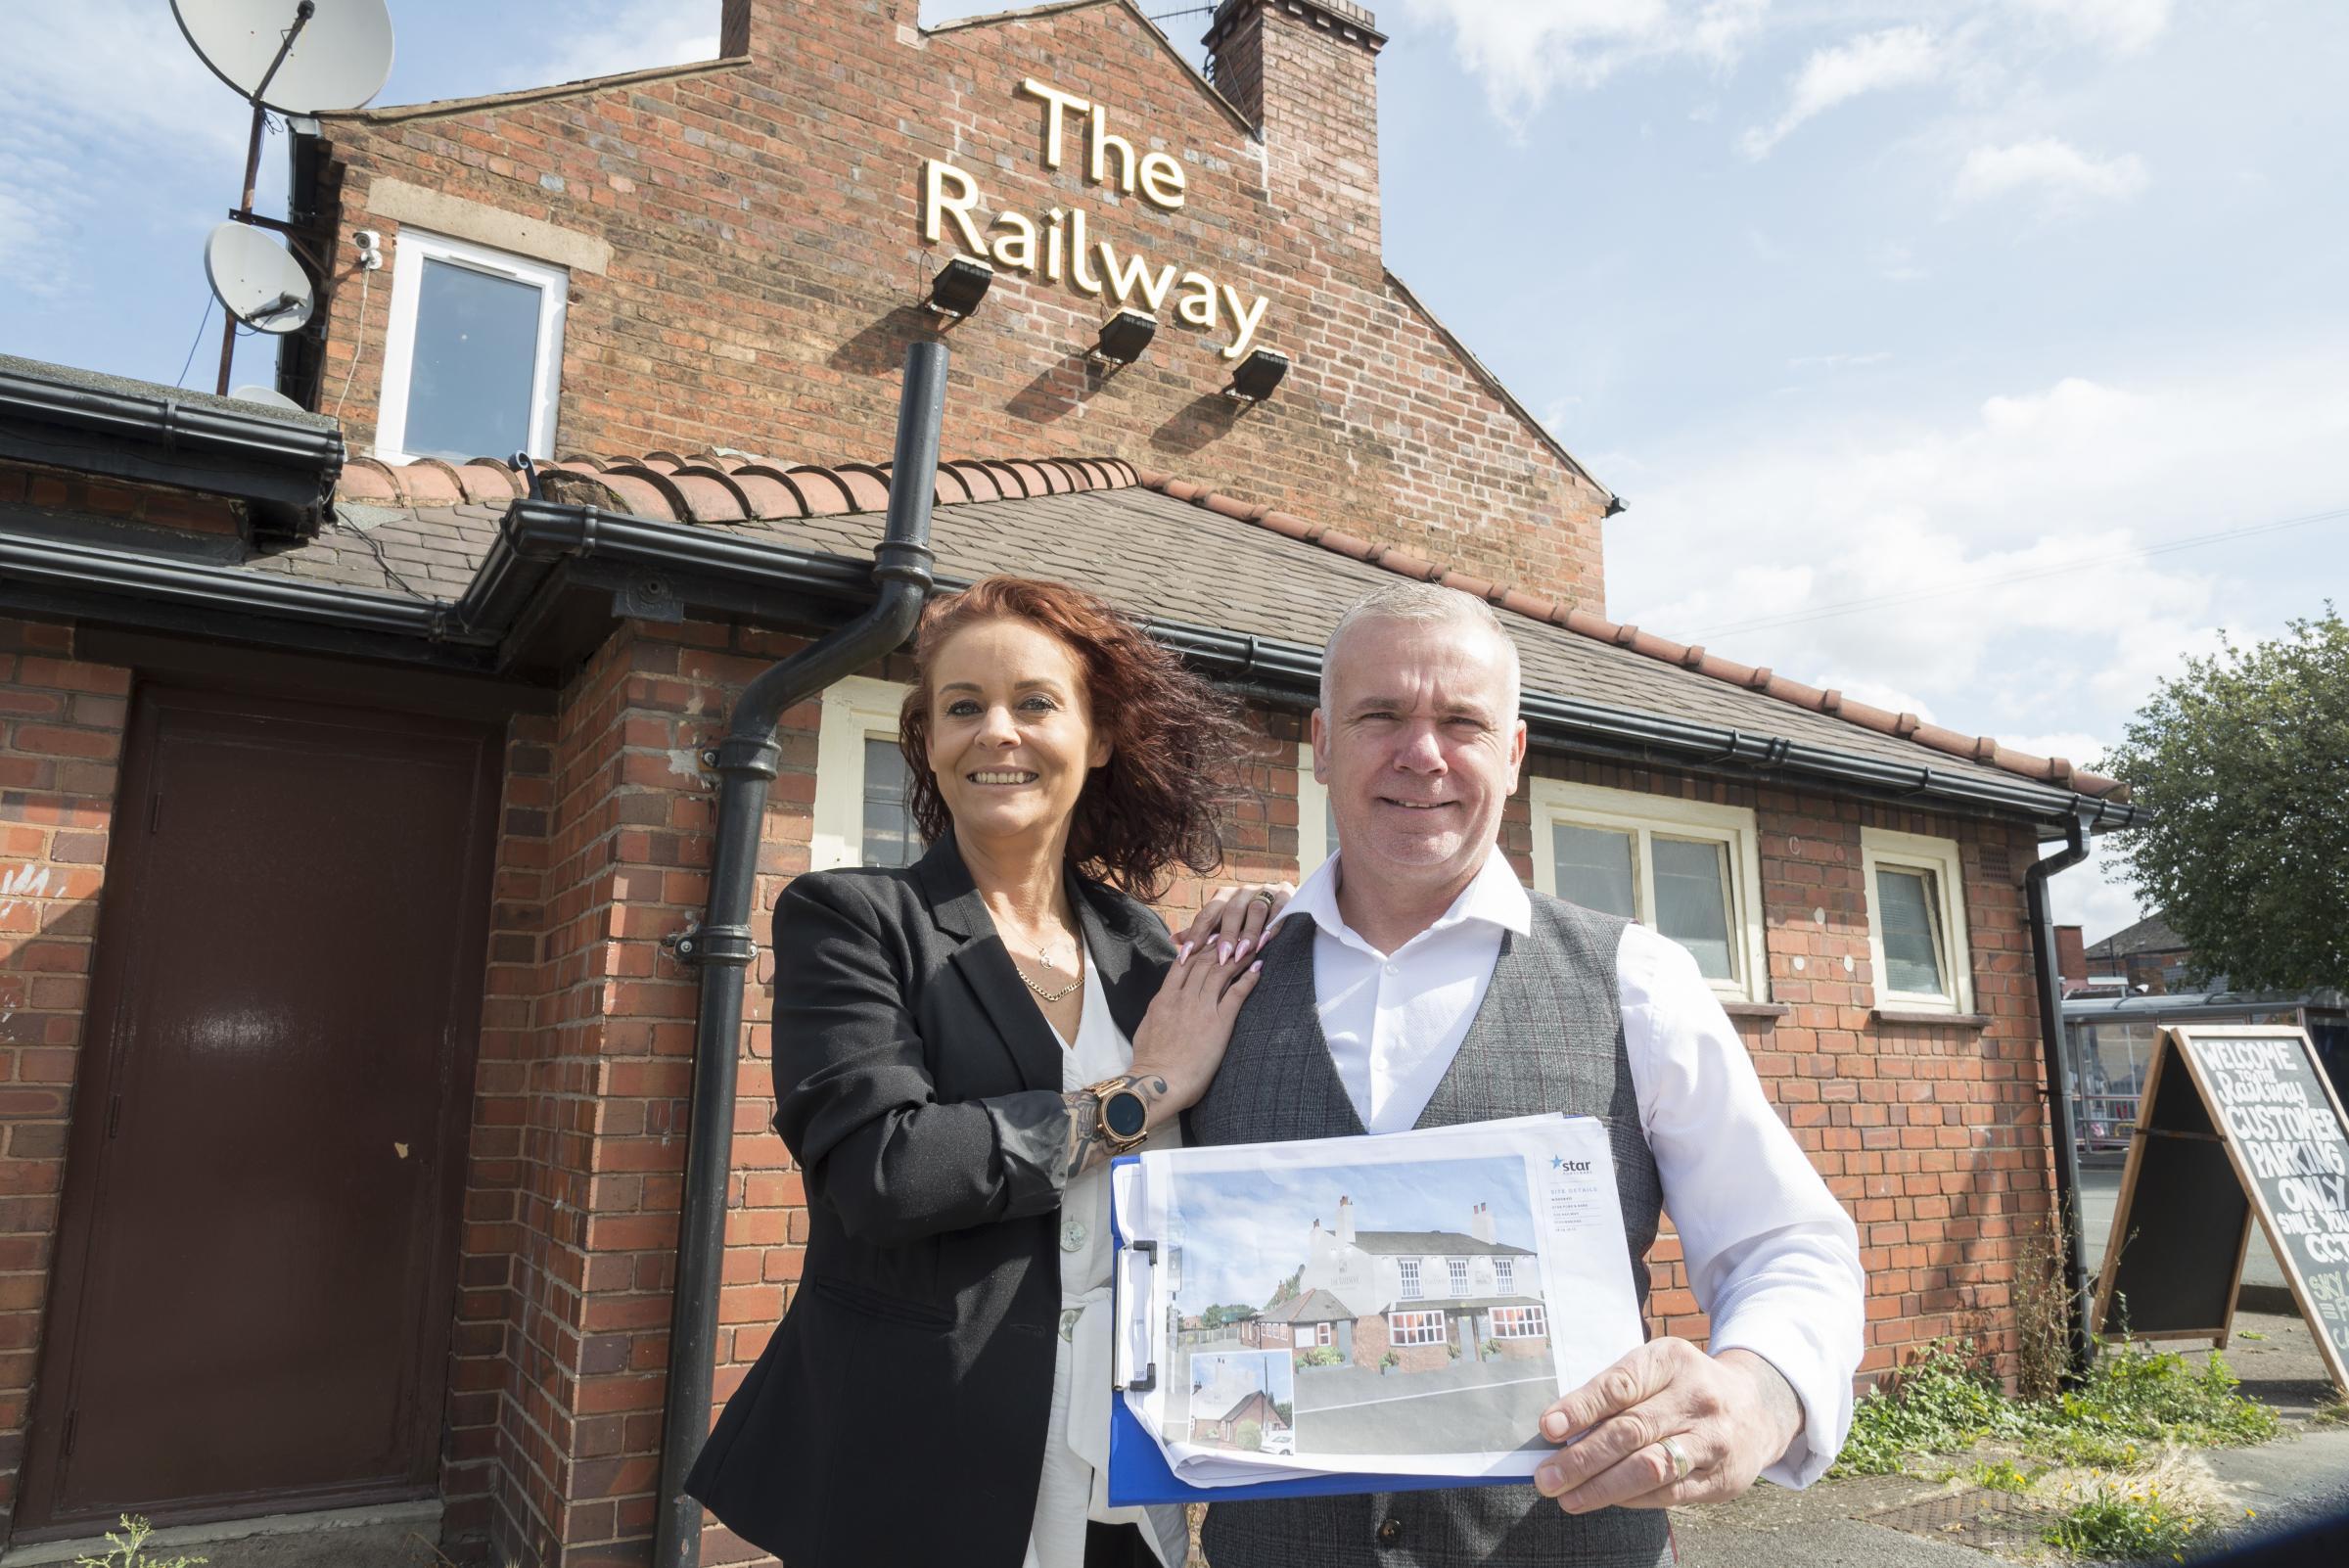 The Railway pub in Lye to close for major refurbishment